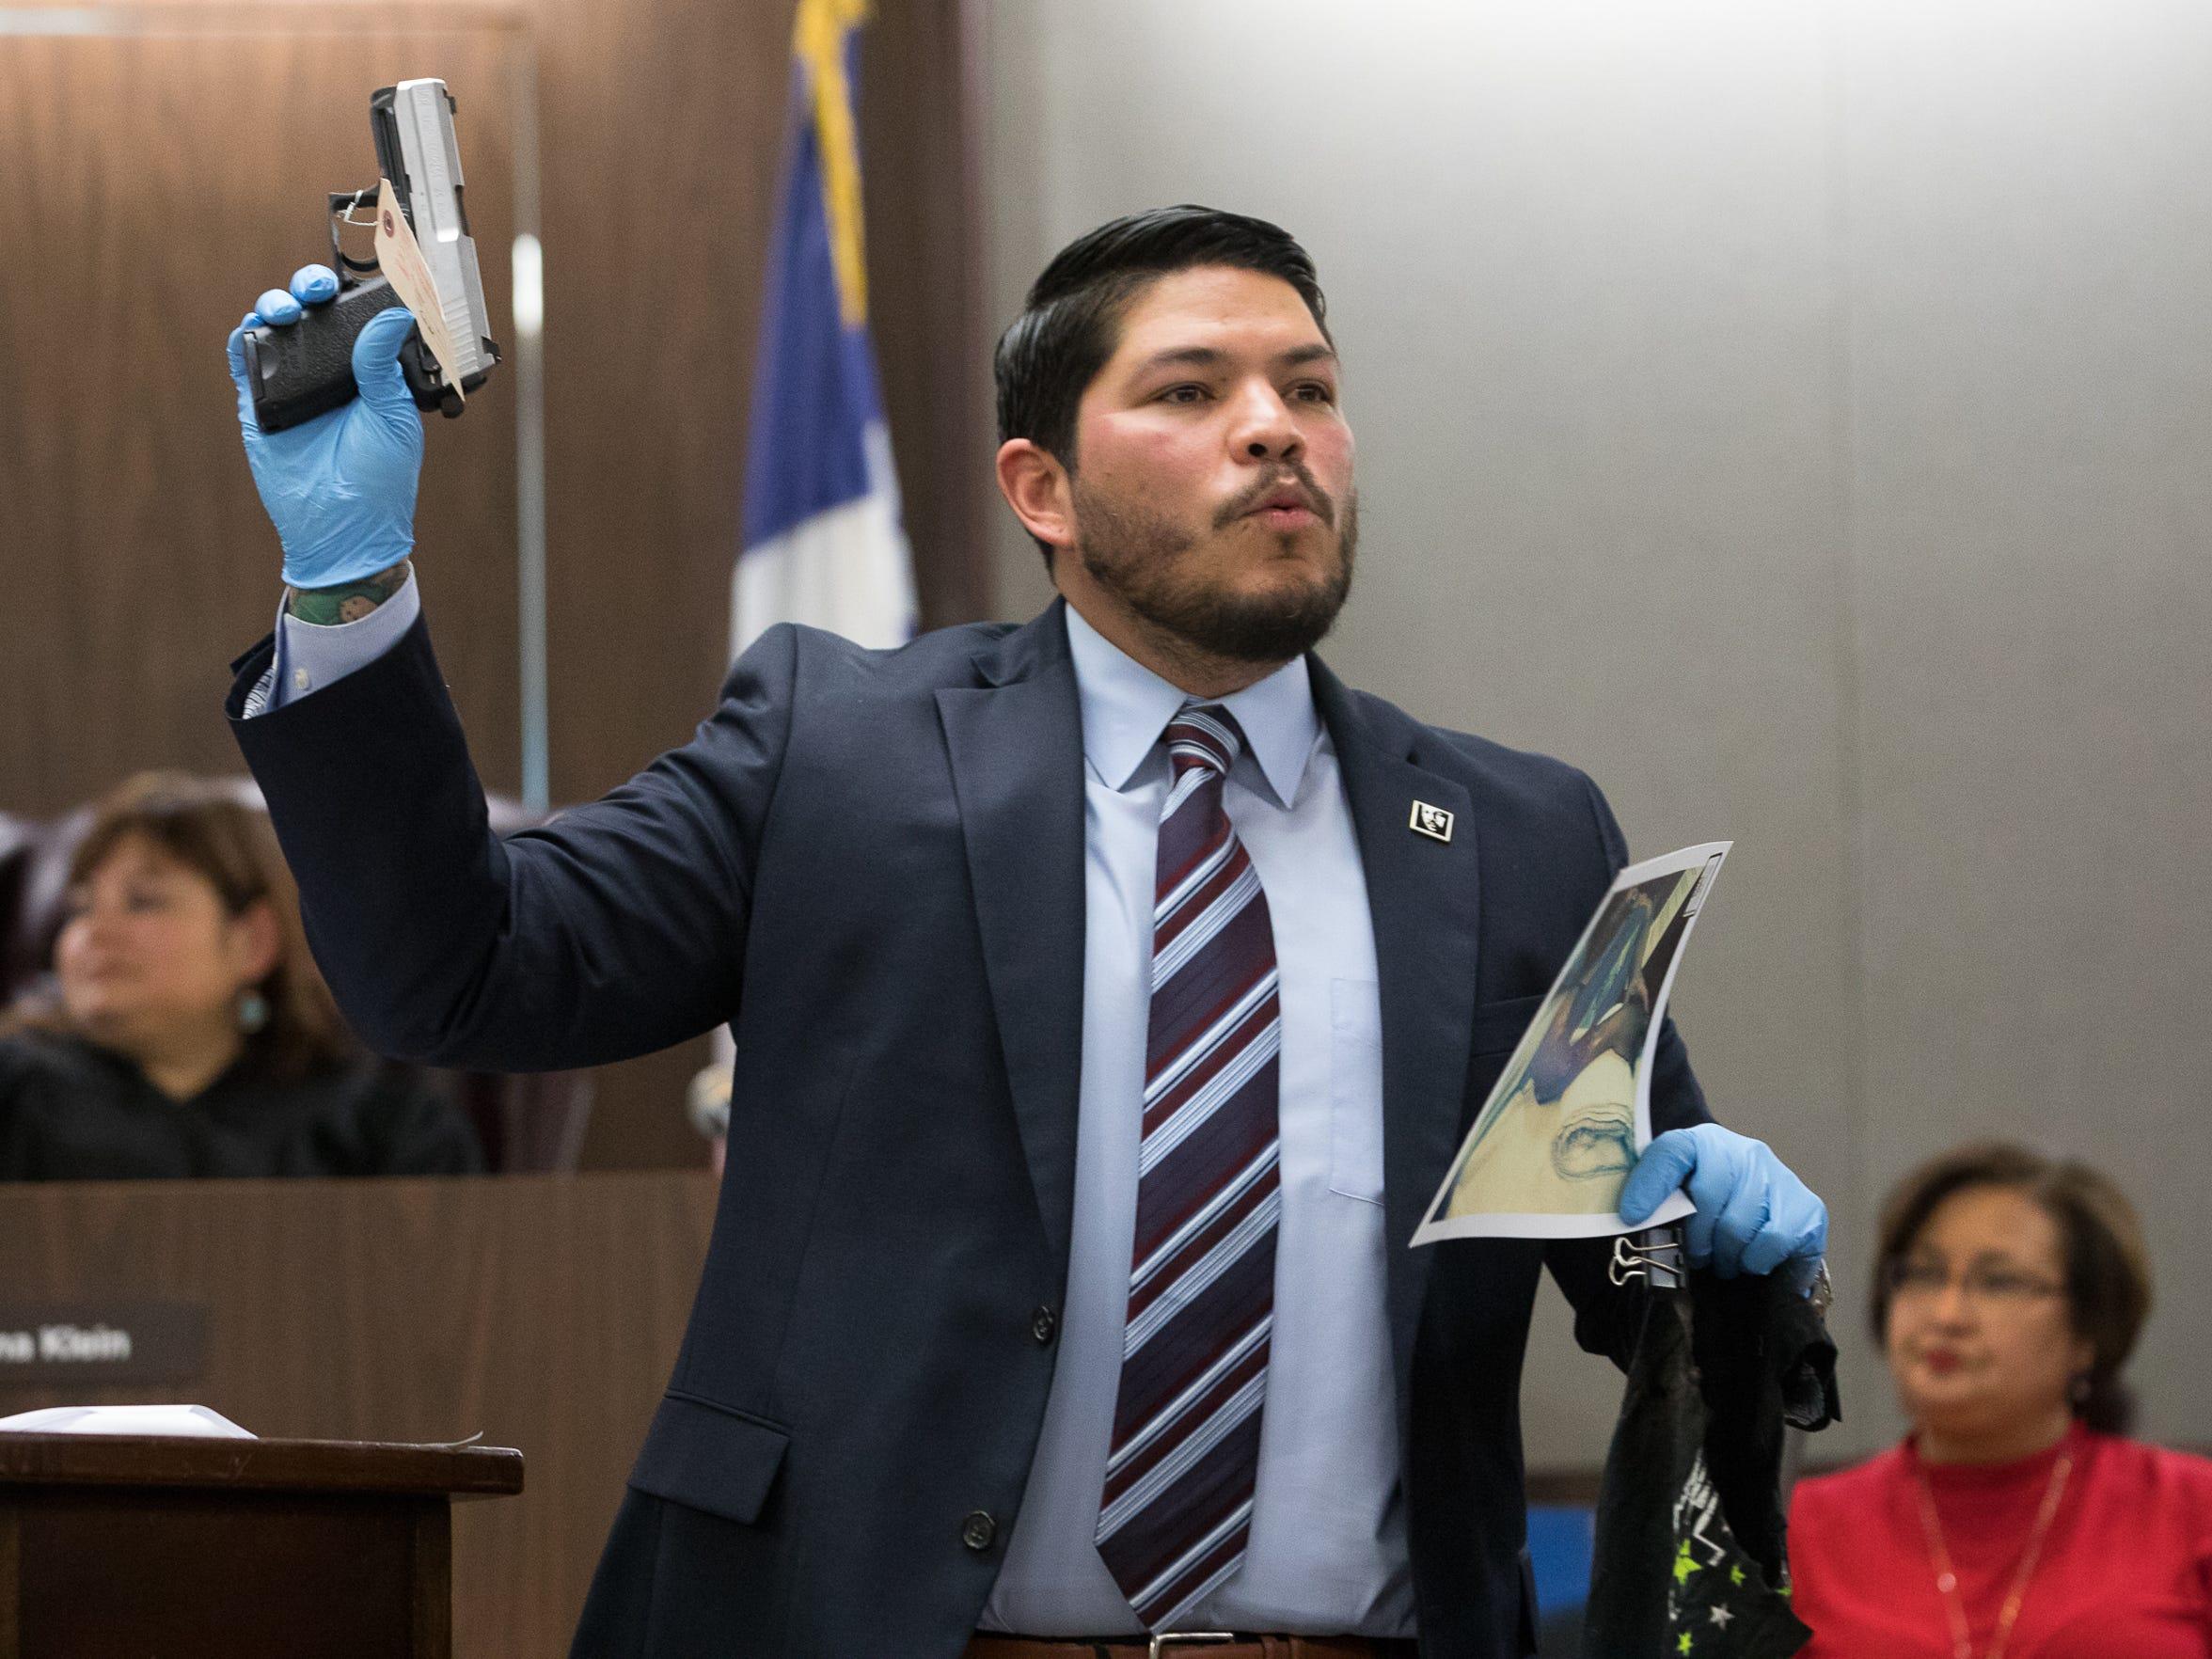 District Attorney Mark Gonzalez holds up a gun as he